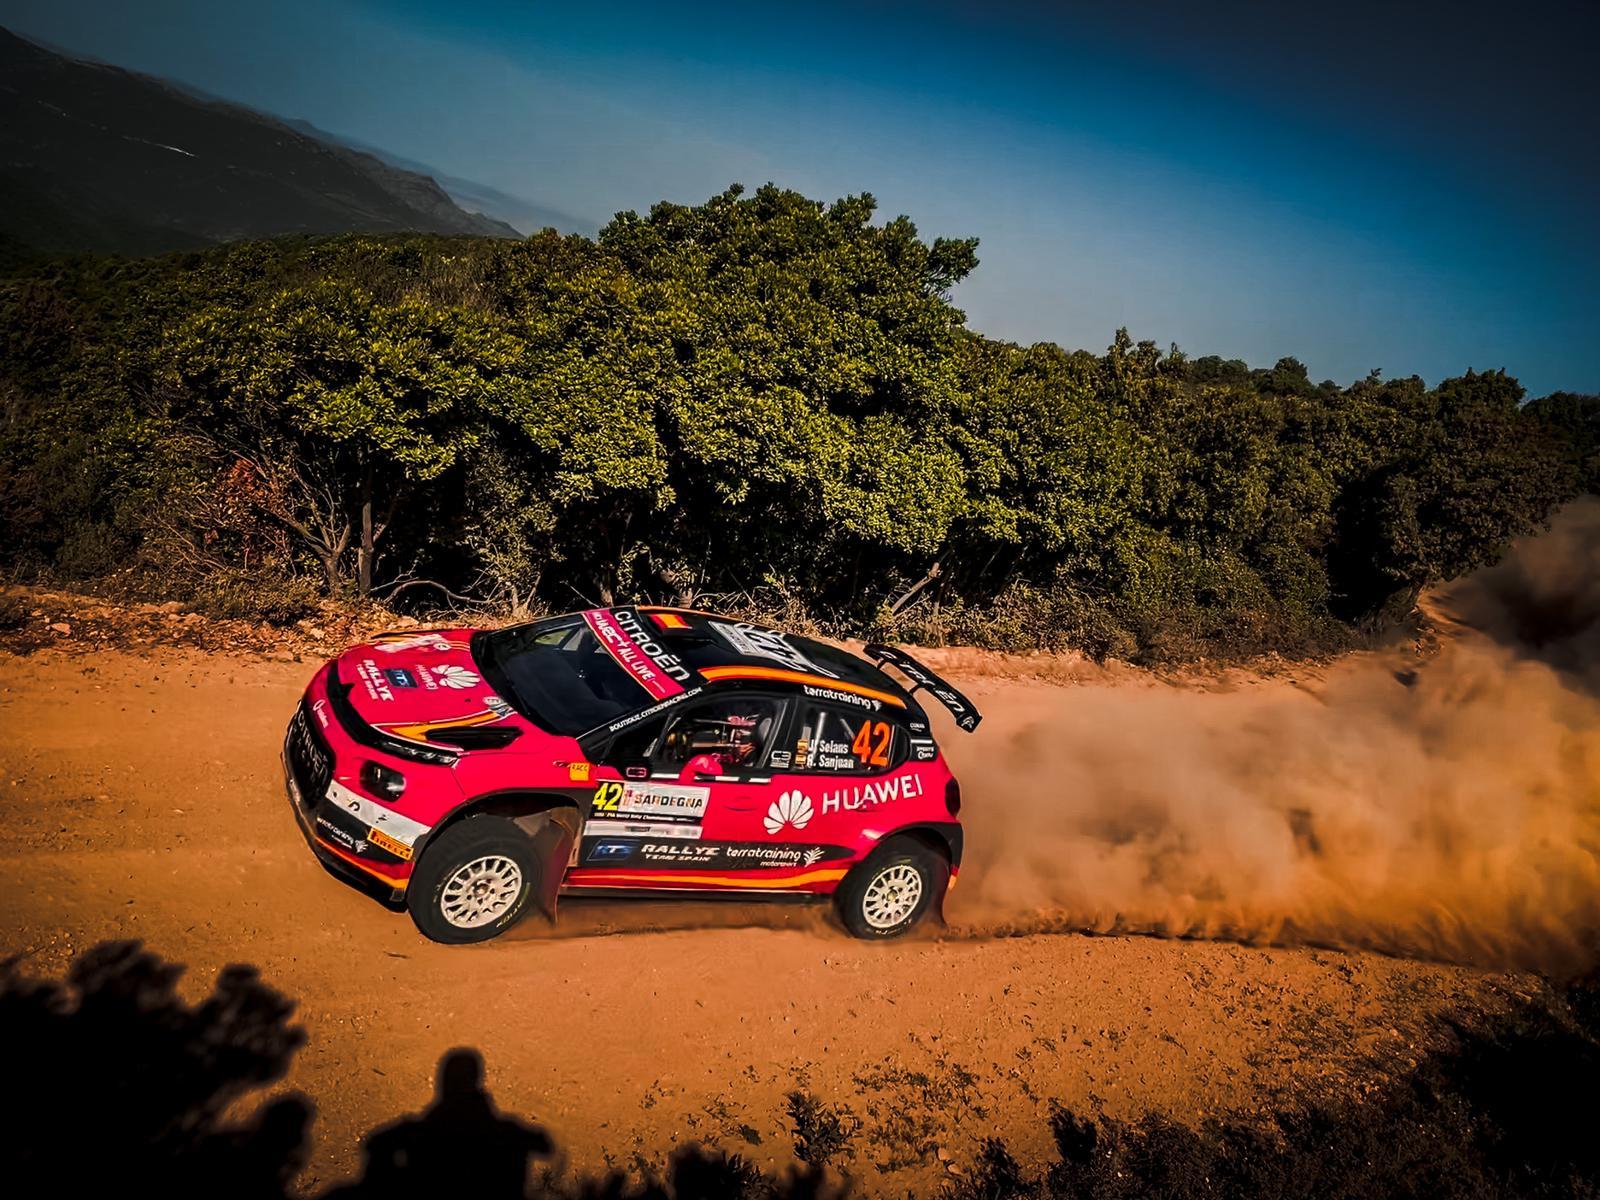 WRC: Rally d'Italia - Sardegna [3-6 Junio] - Página 3 20210604092212